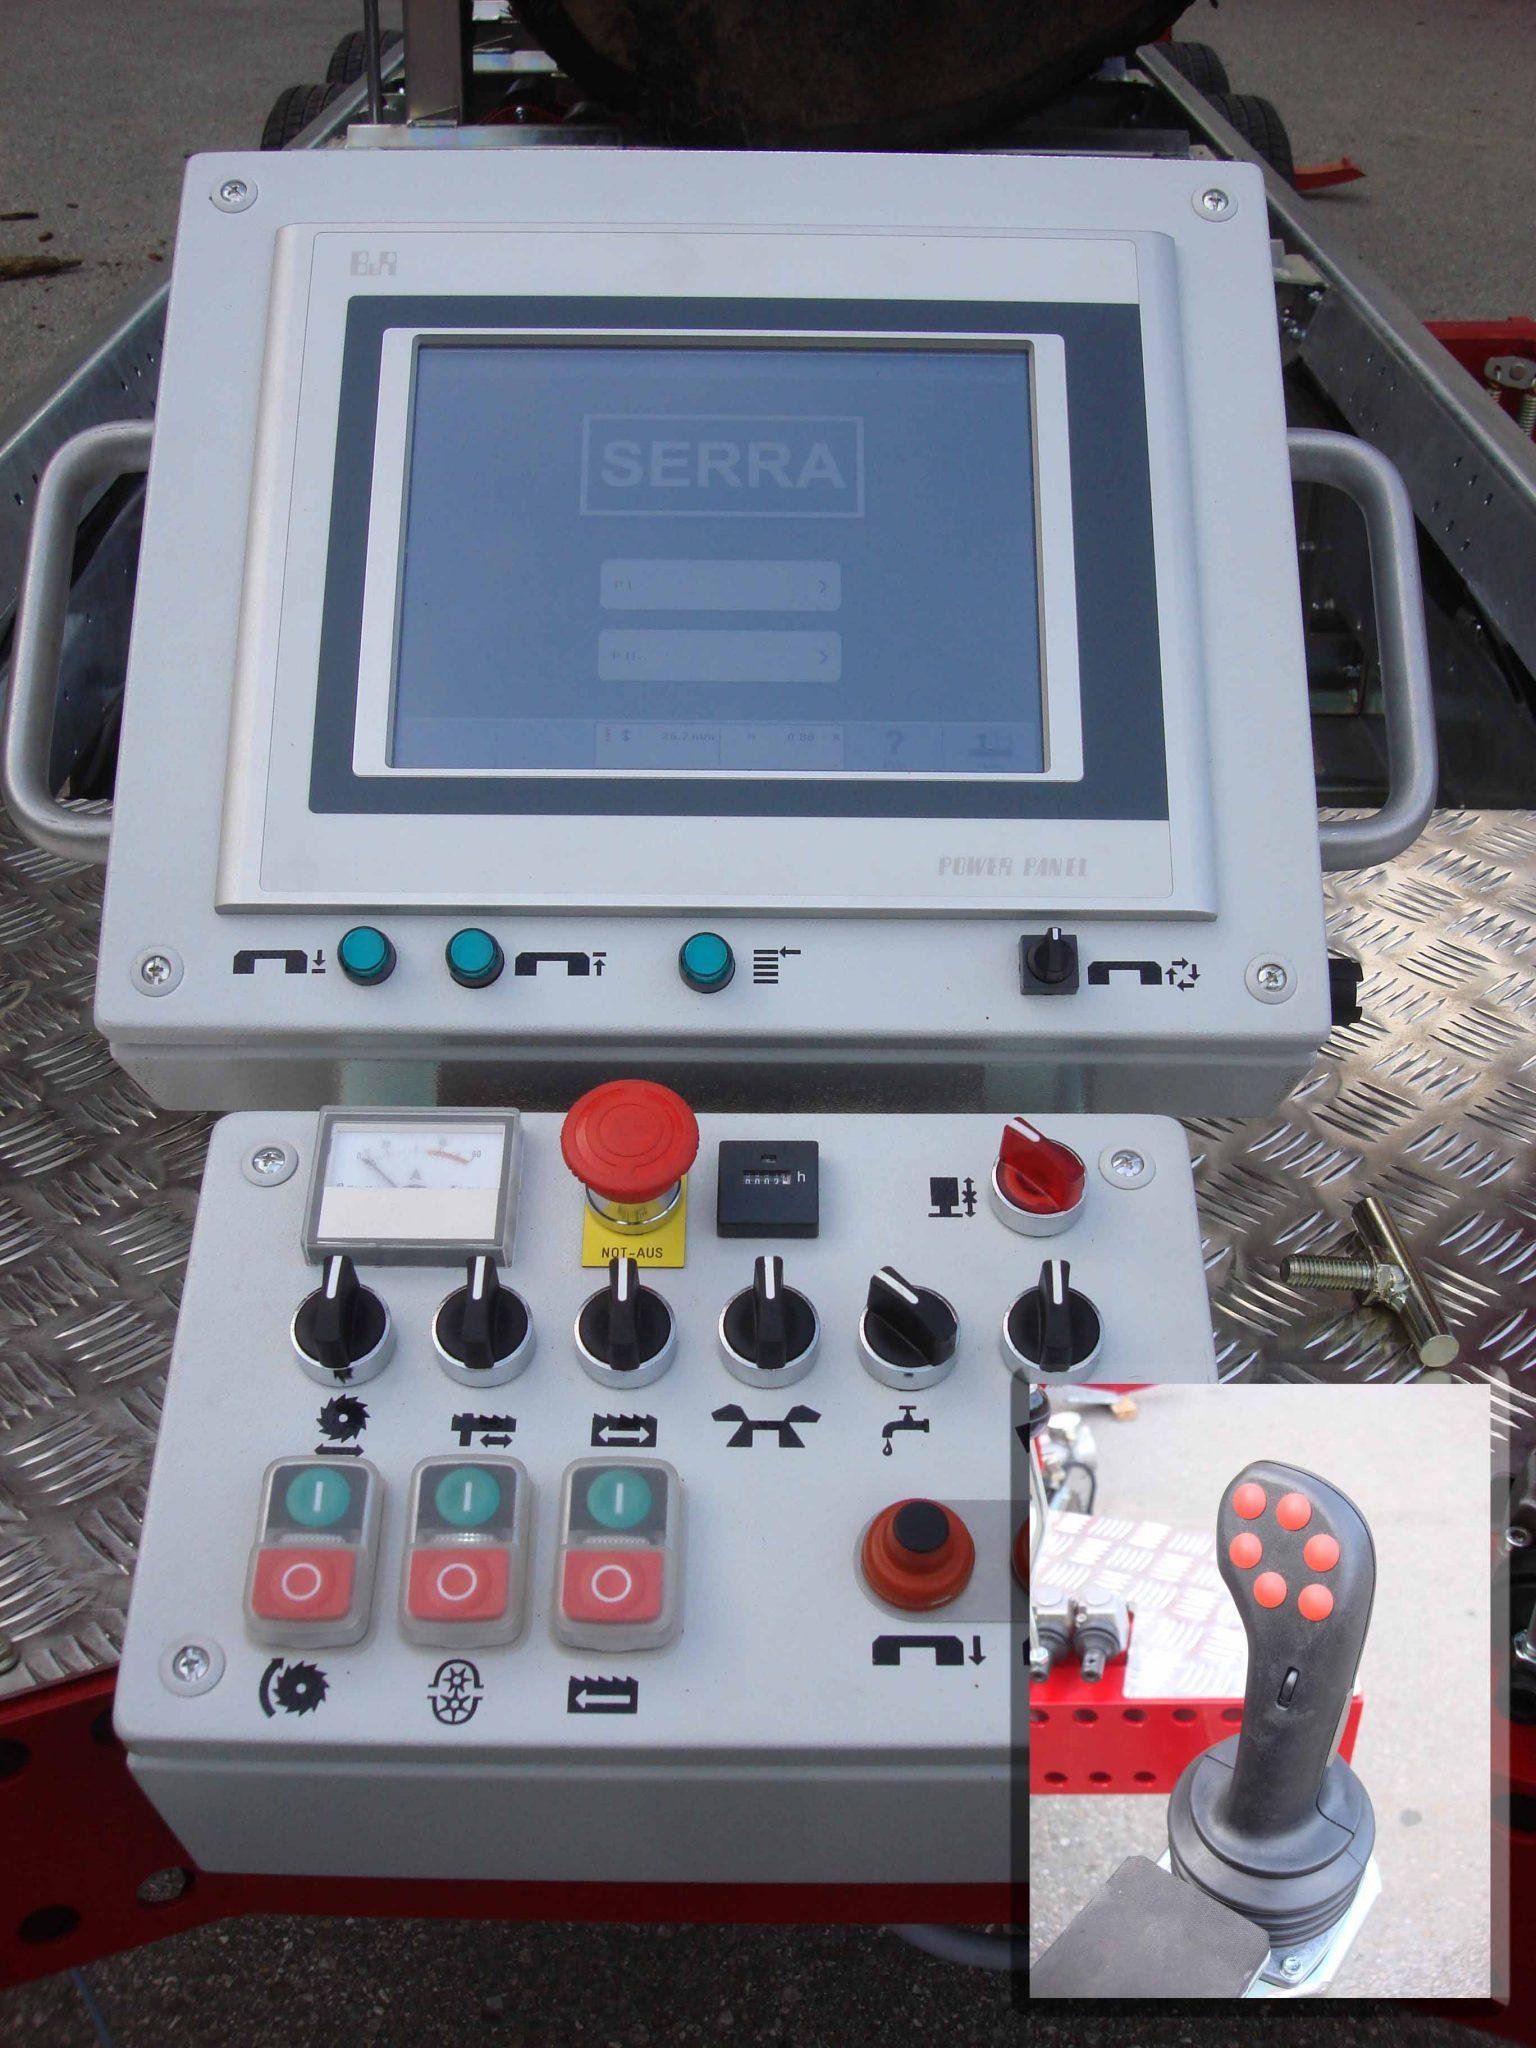 SERRA-POSI-Comfort-PLUS-scaled Computerized controls